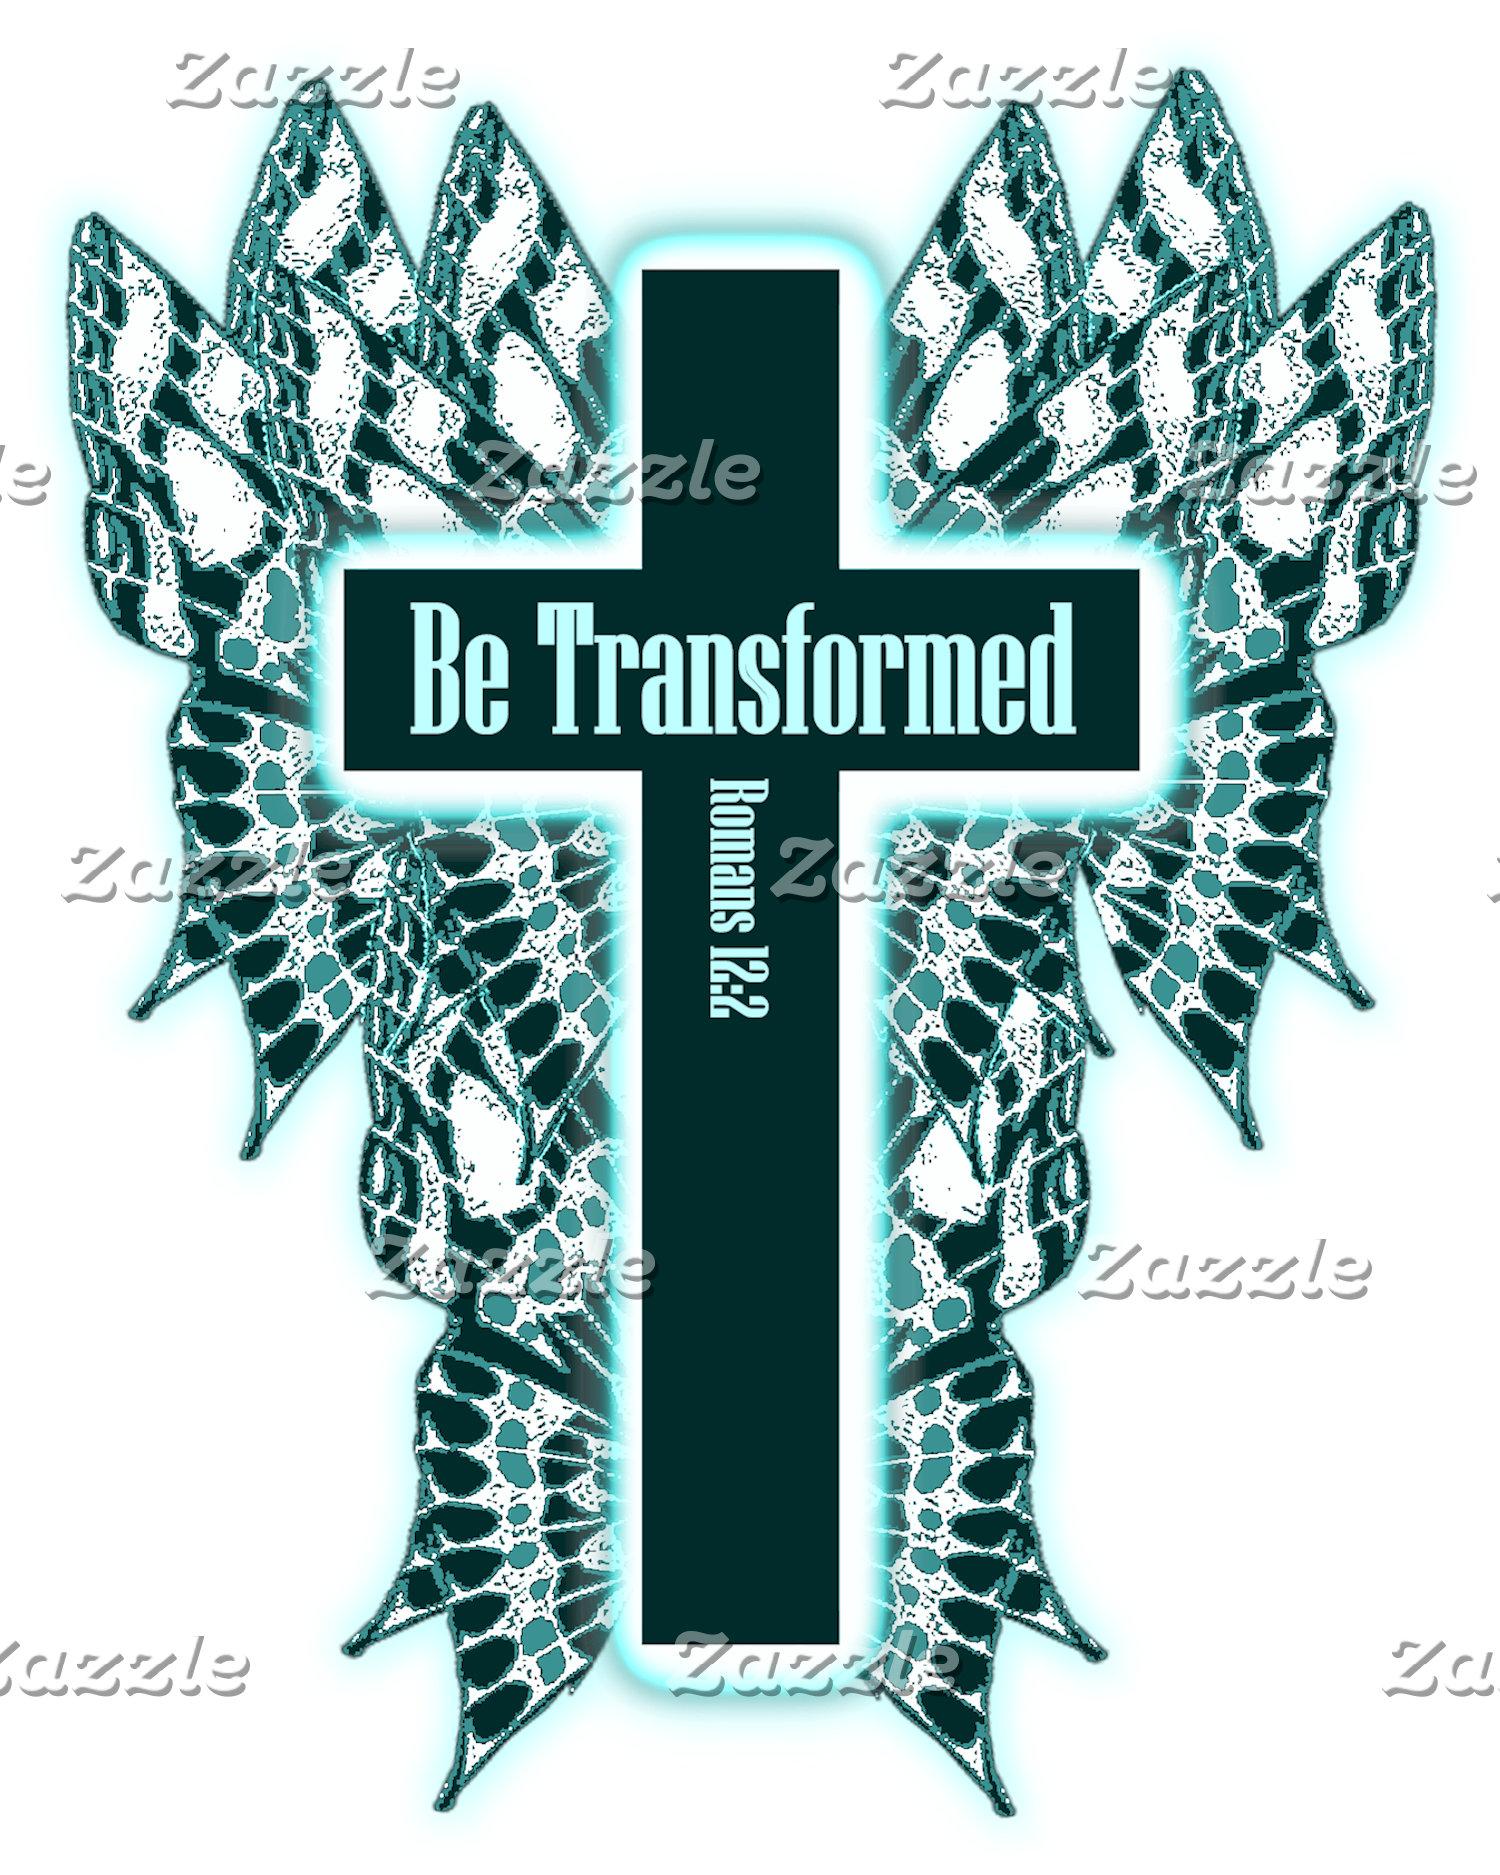 Be Transformed - Romans 12:2